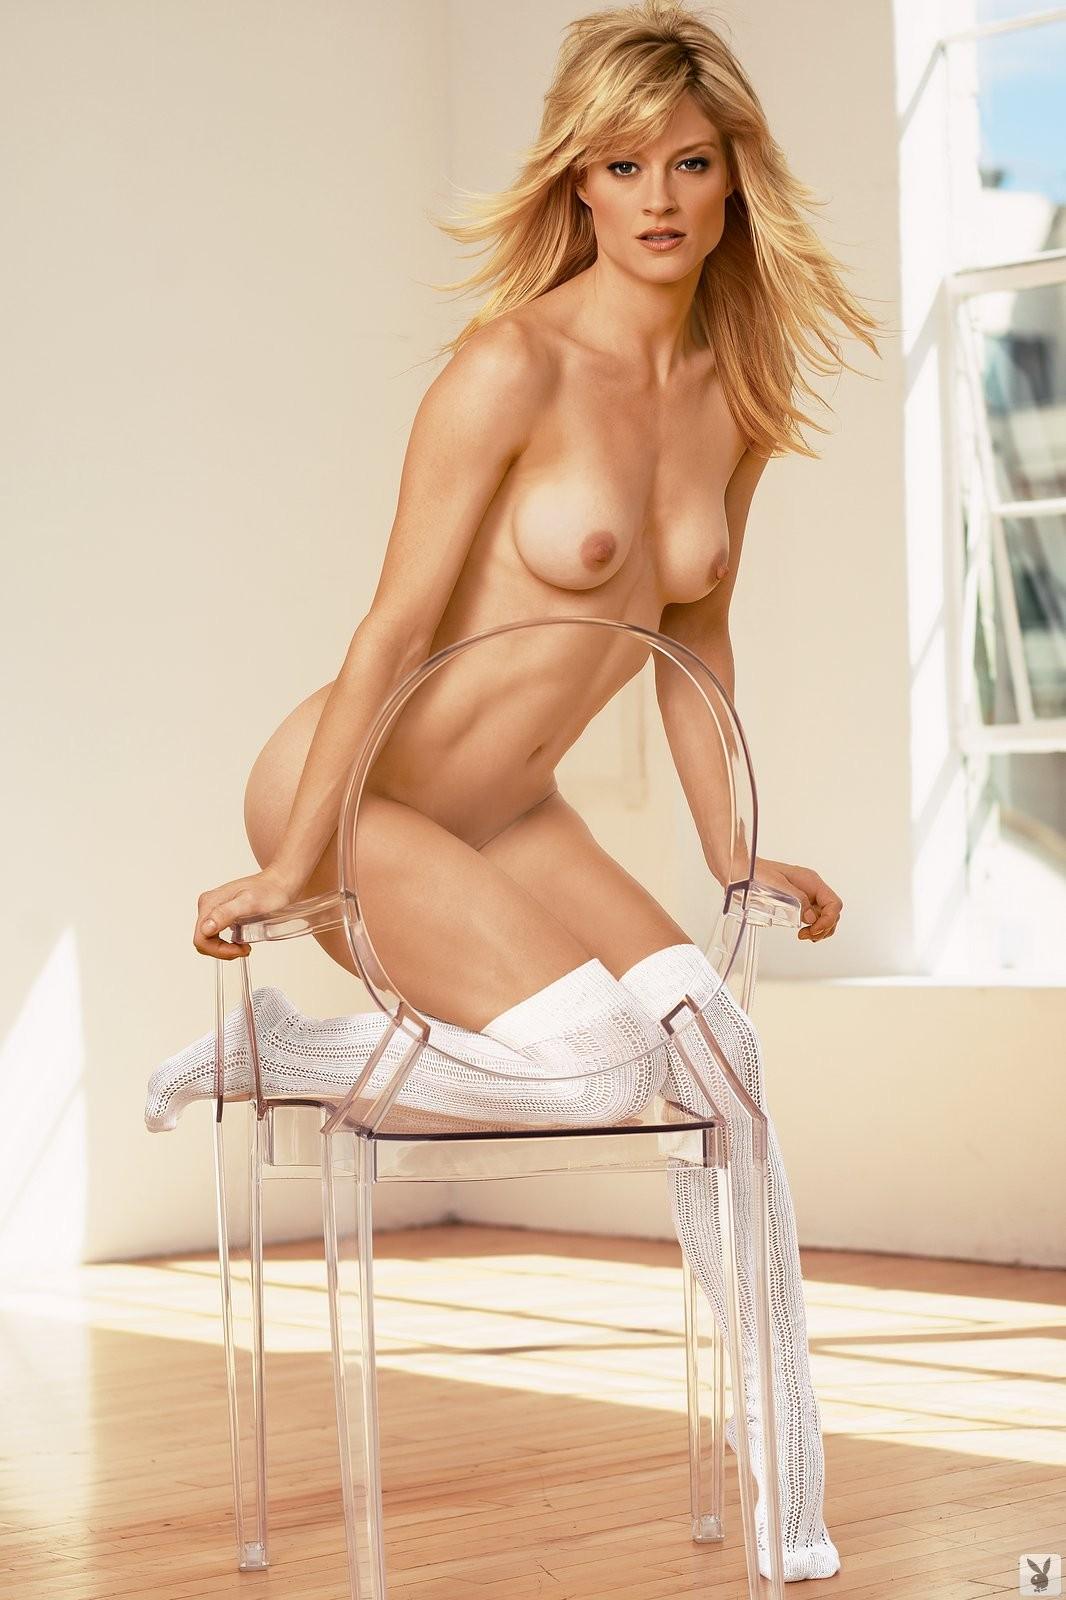 Teri polo nude pics